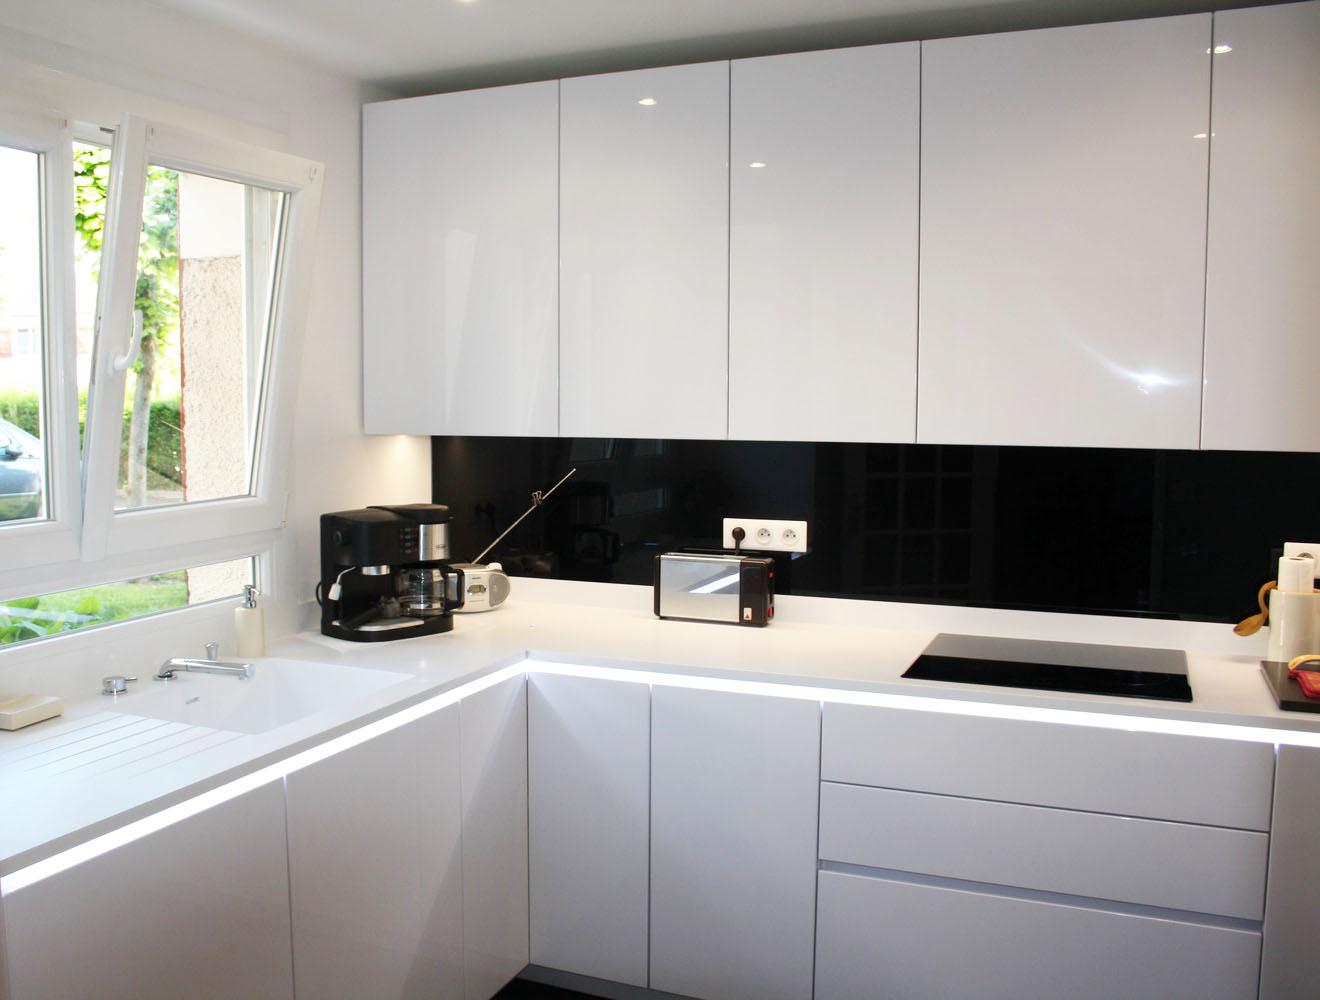 cuisine lancourt 78 plan de travail corian baie vitr e. Black Bedroom Furniture Sets. Home Design Ideas